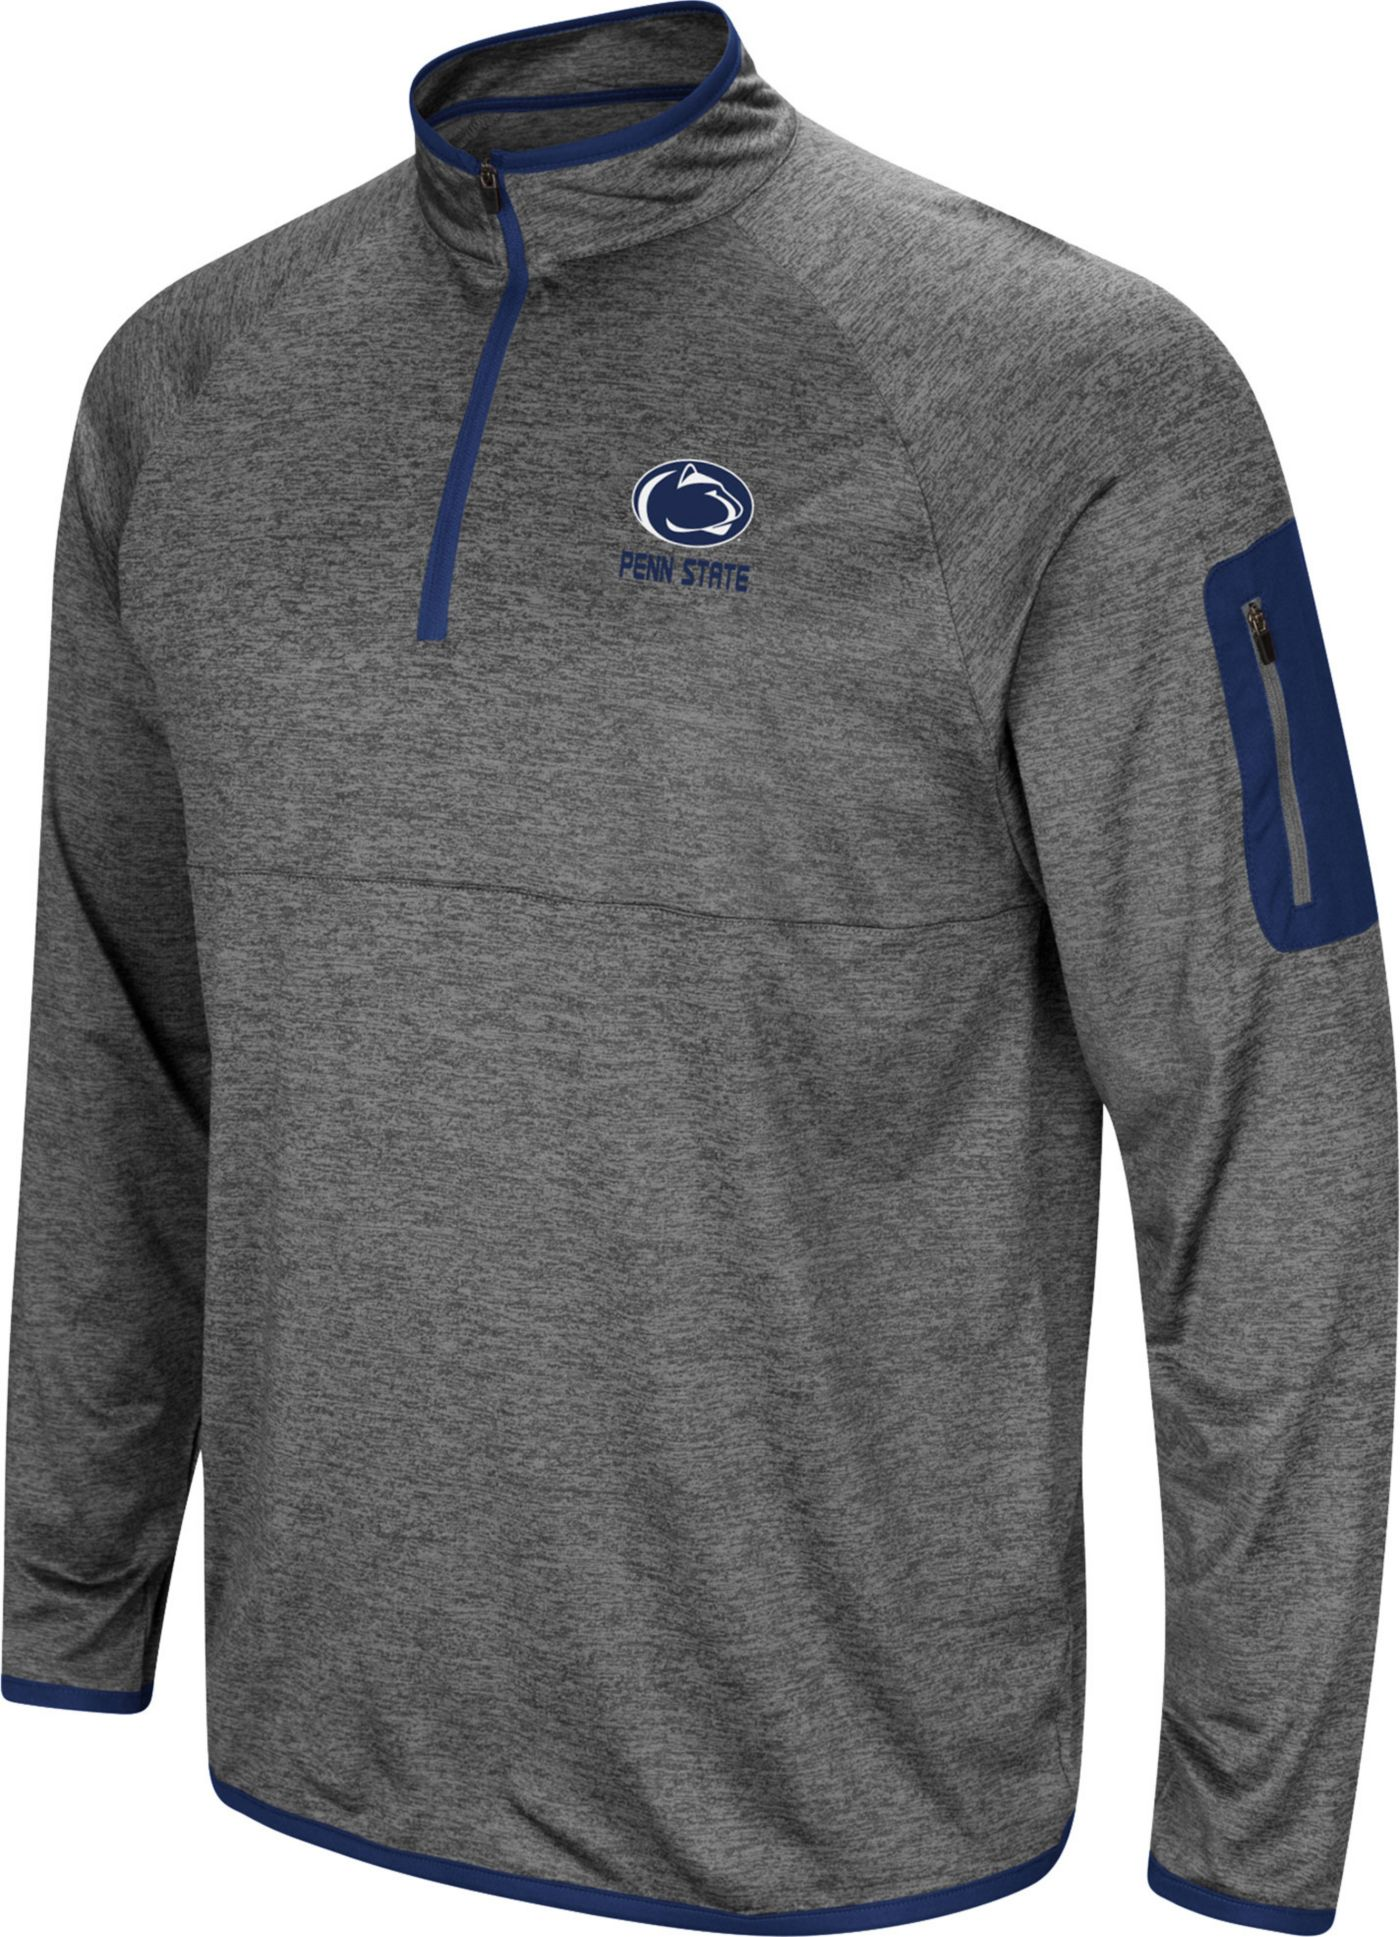 Colosseum Men's Penn State Nittany Lions Grey Indus River Quarter-Zip Shirt